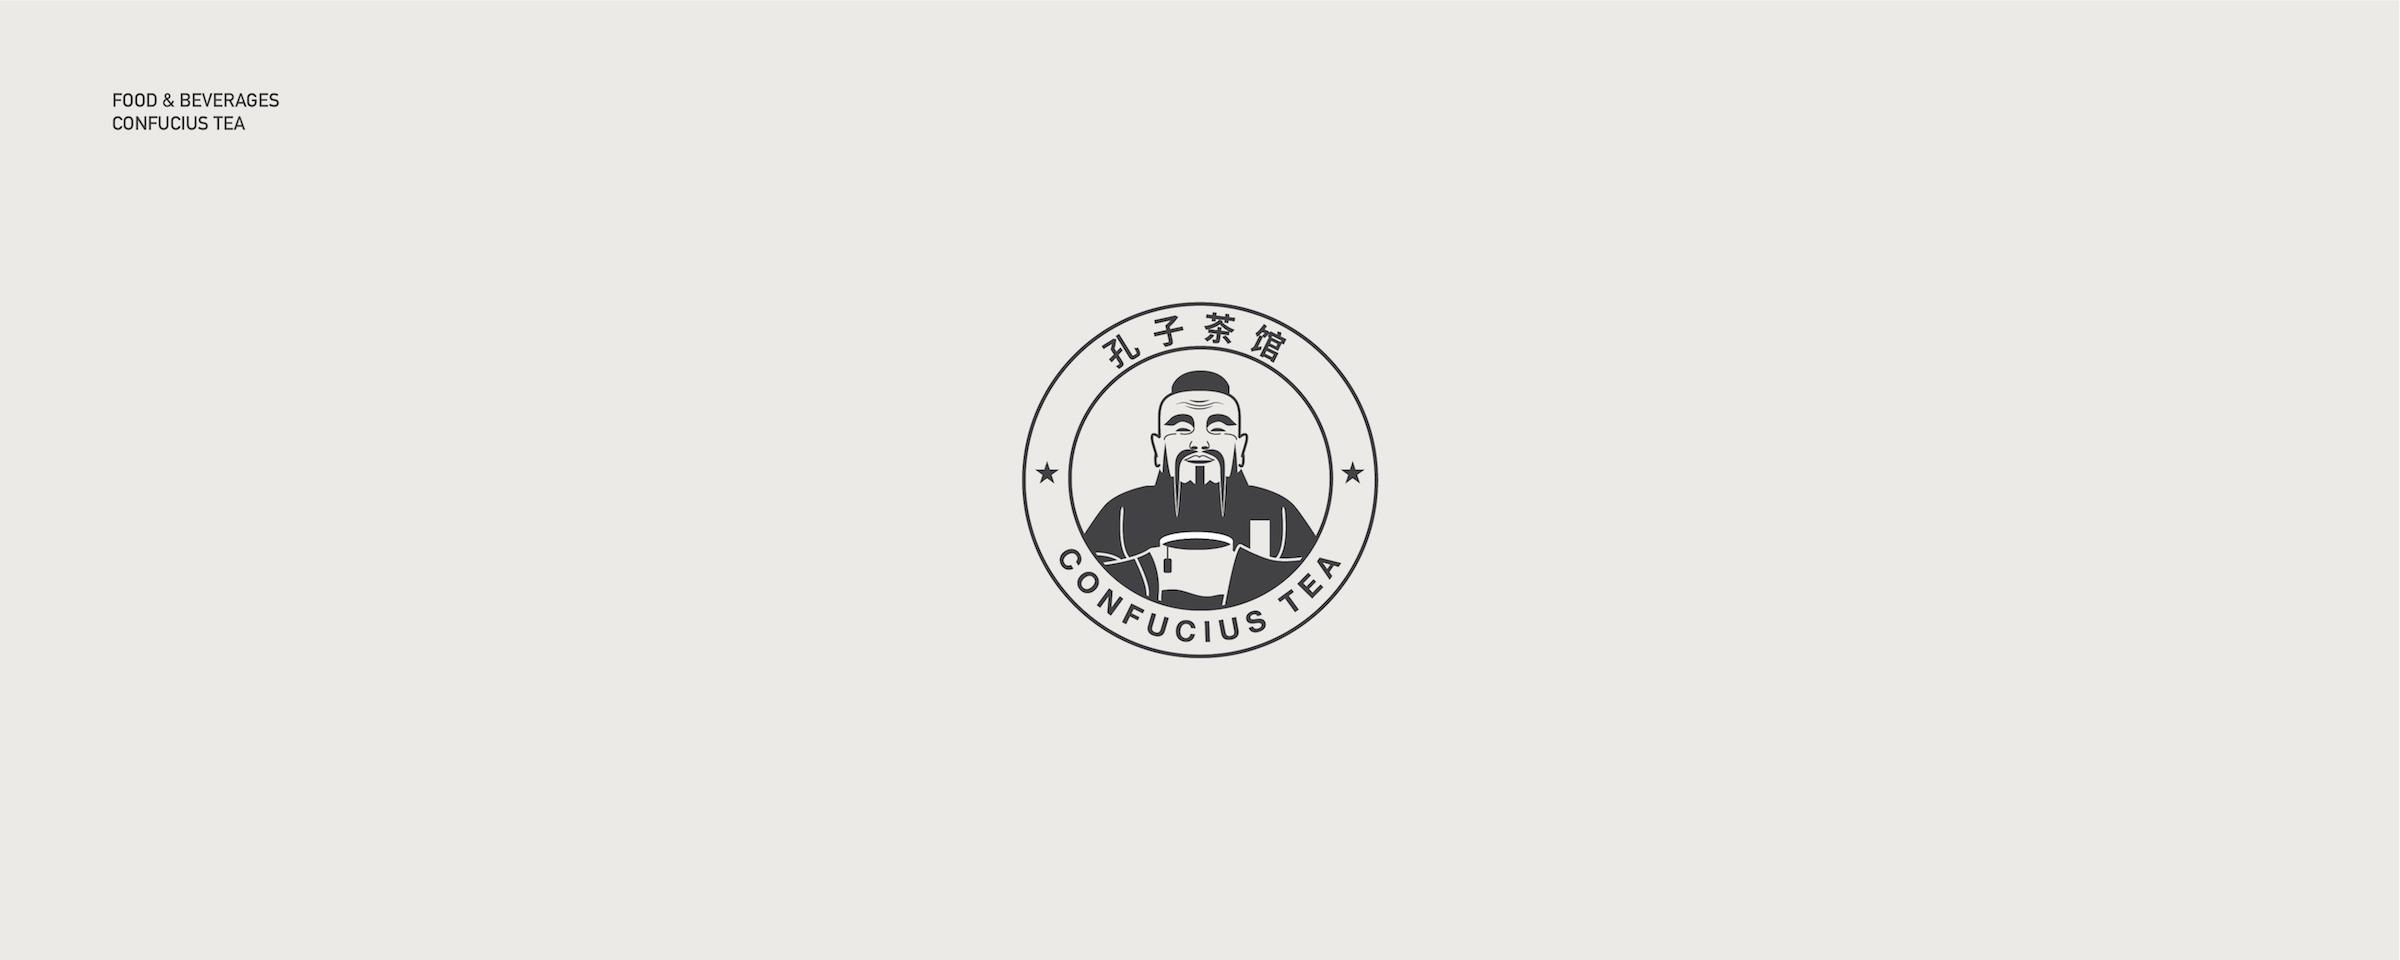 tea brand logo